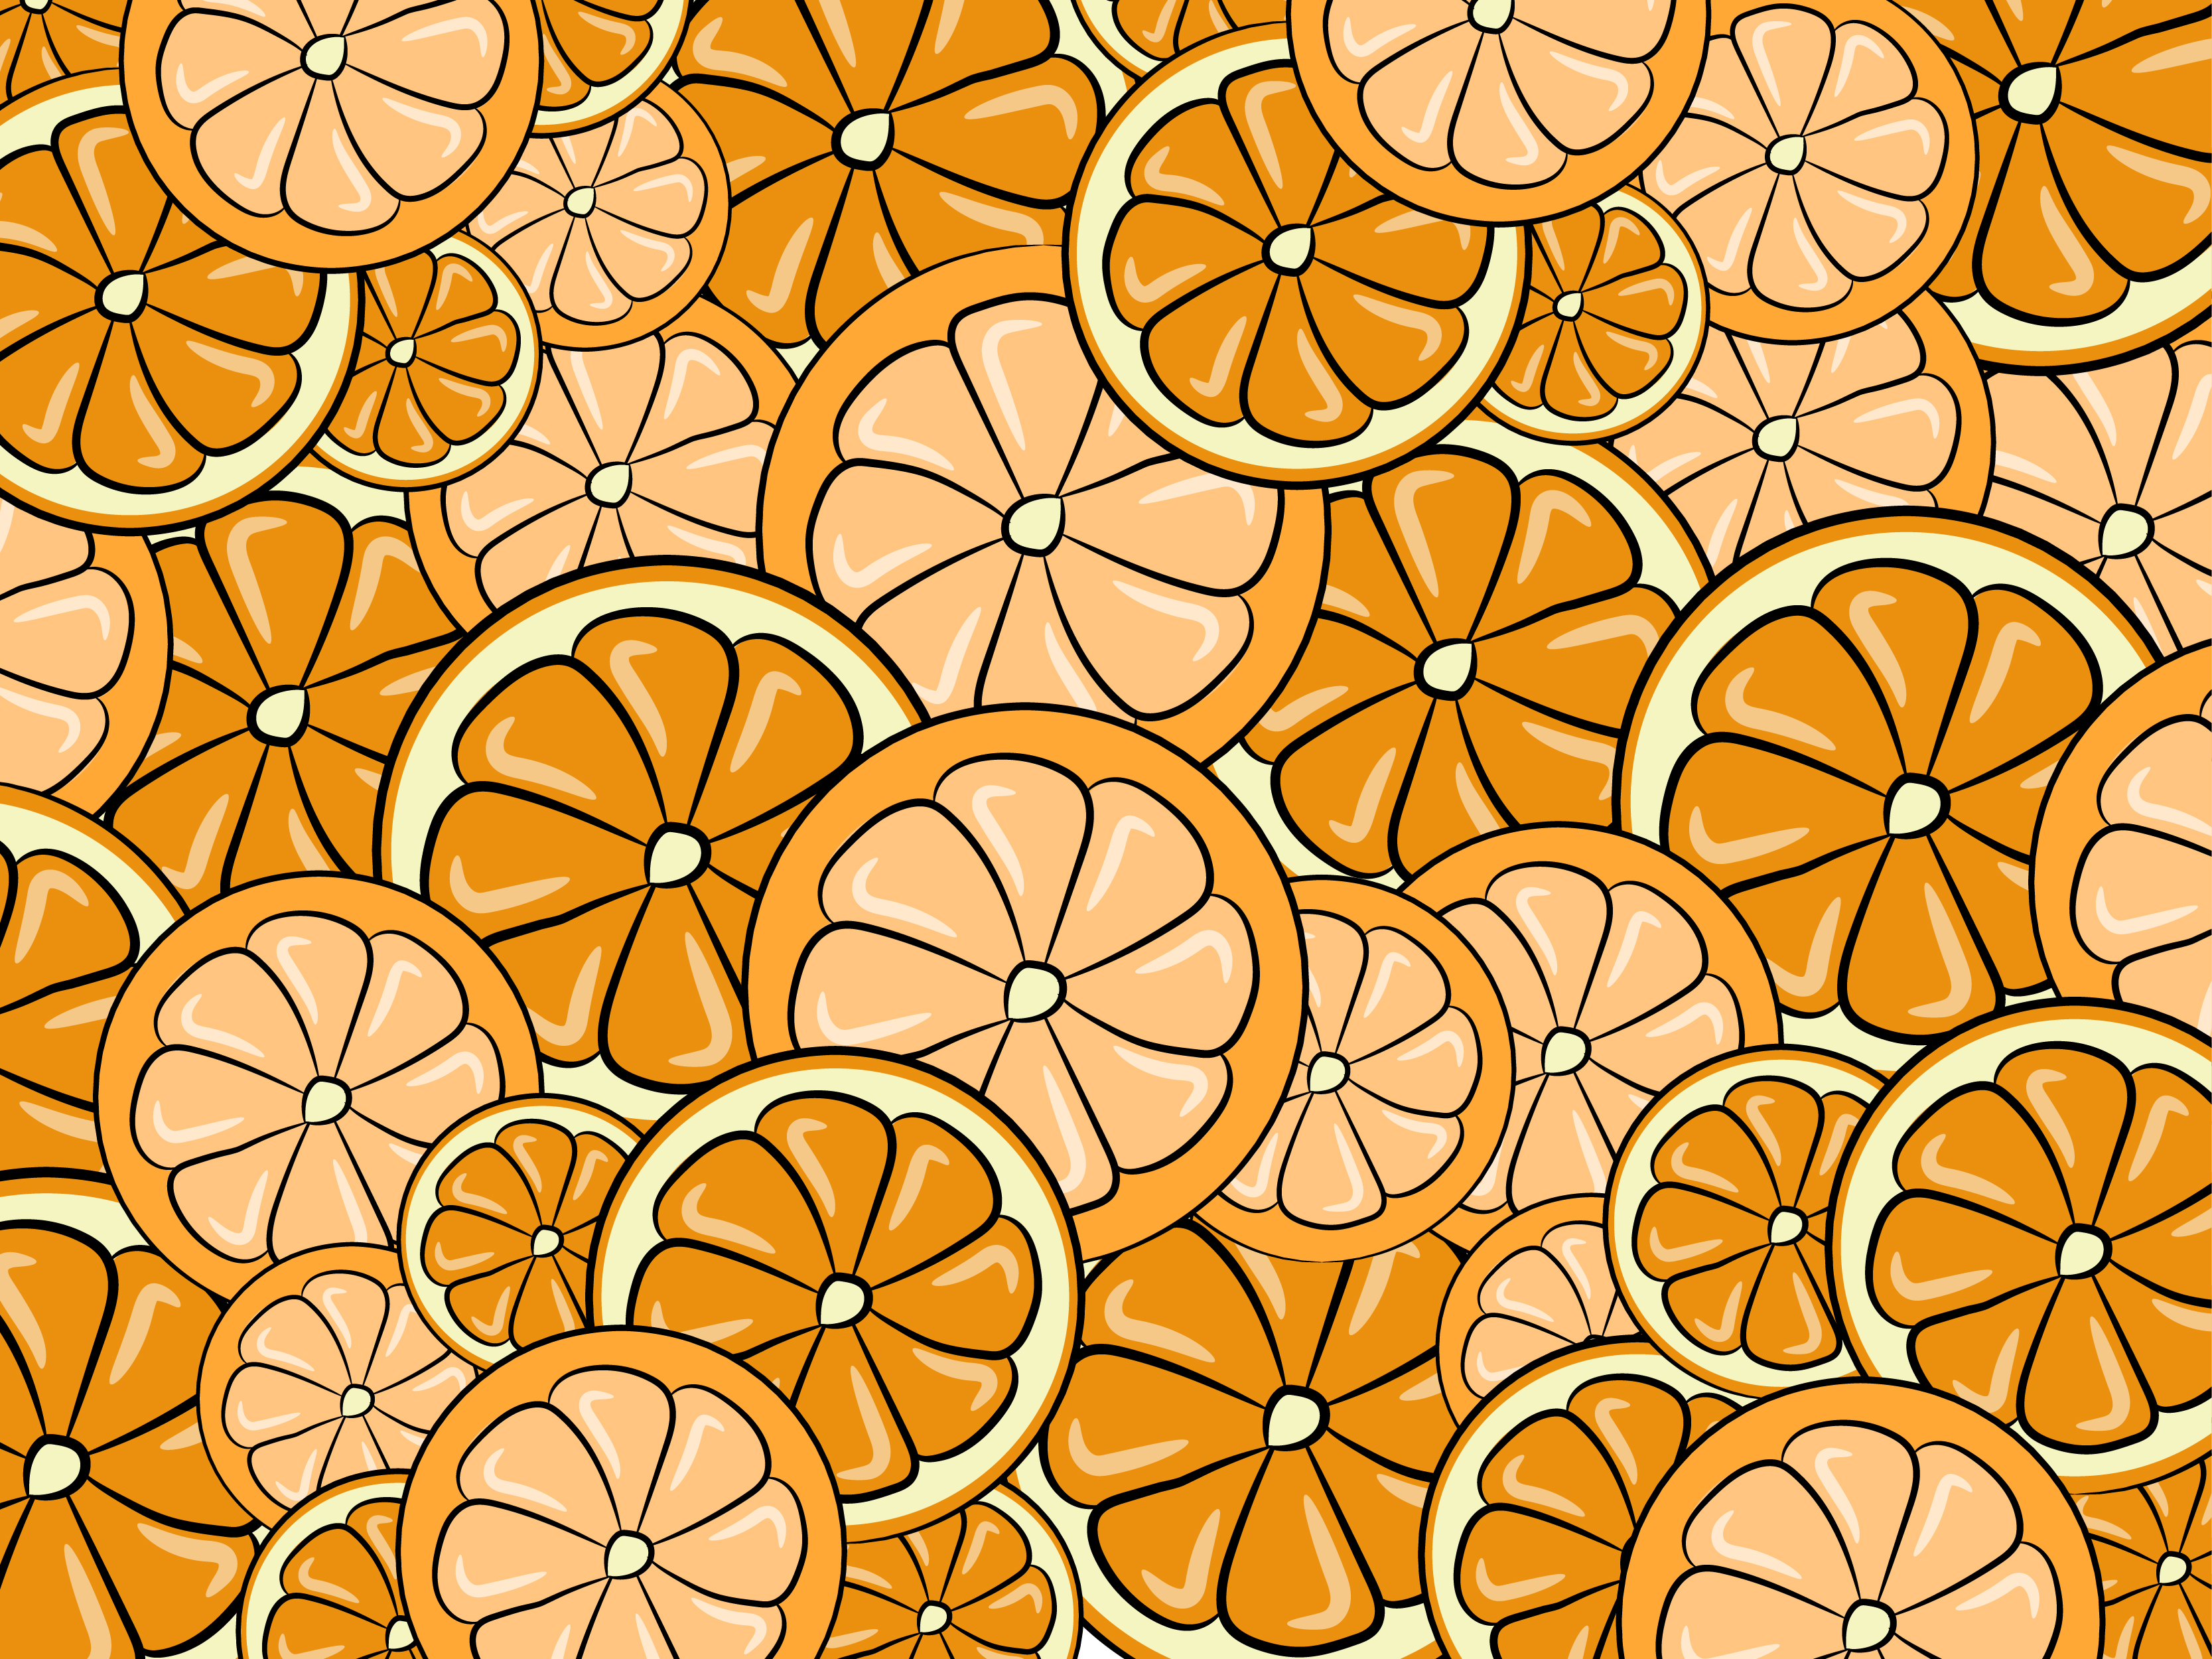 Orange Background Free Vector Art